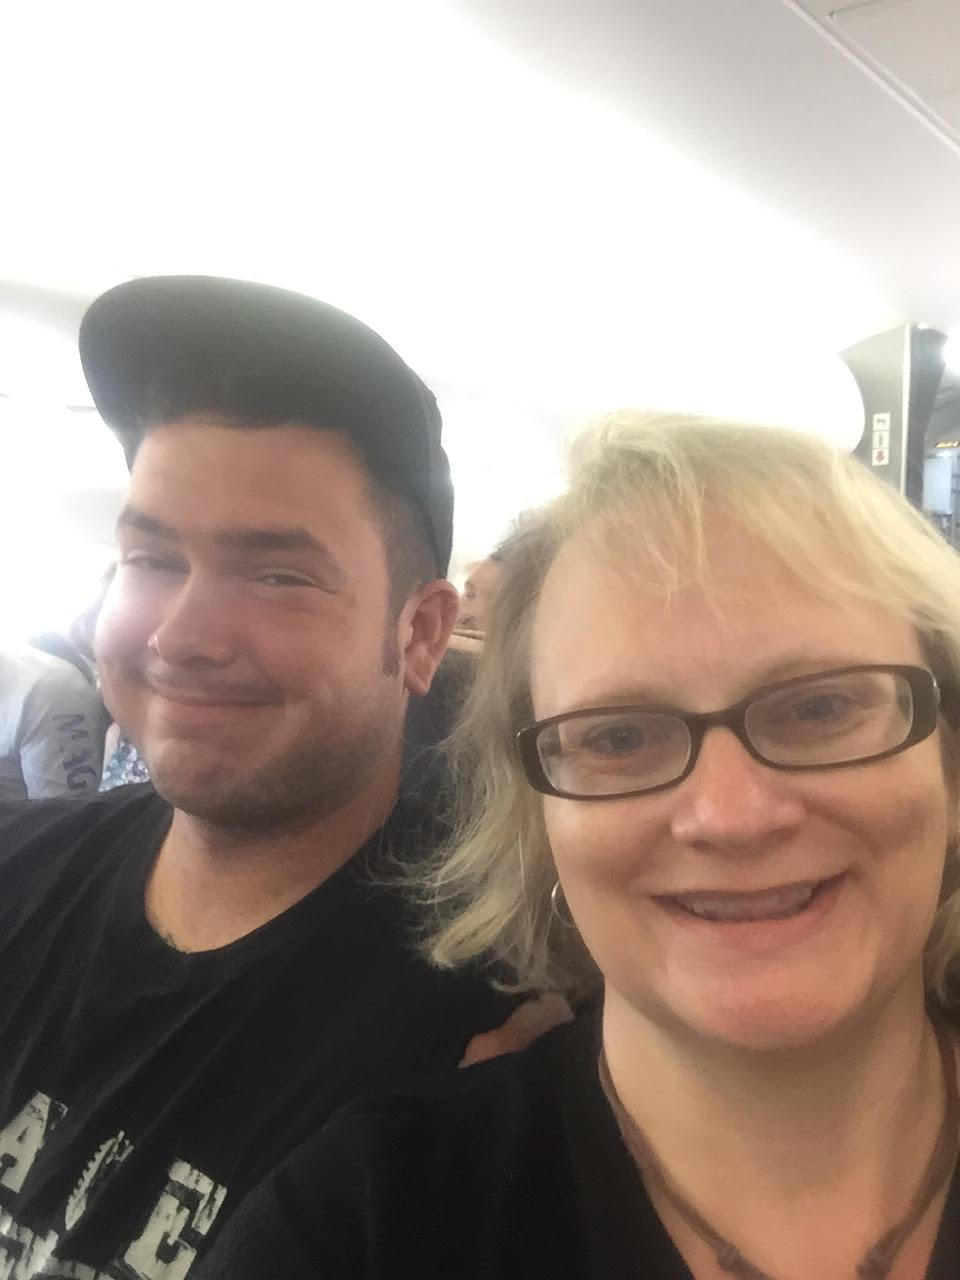 HappinessUnites Tour Amarillo, Happiness Happens Month, #HappinessUnites, Secret Society of Happy People, SOHP.com, Pamela Gail Johnson, Amarillo TX, Amarillo Airport